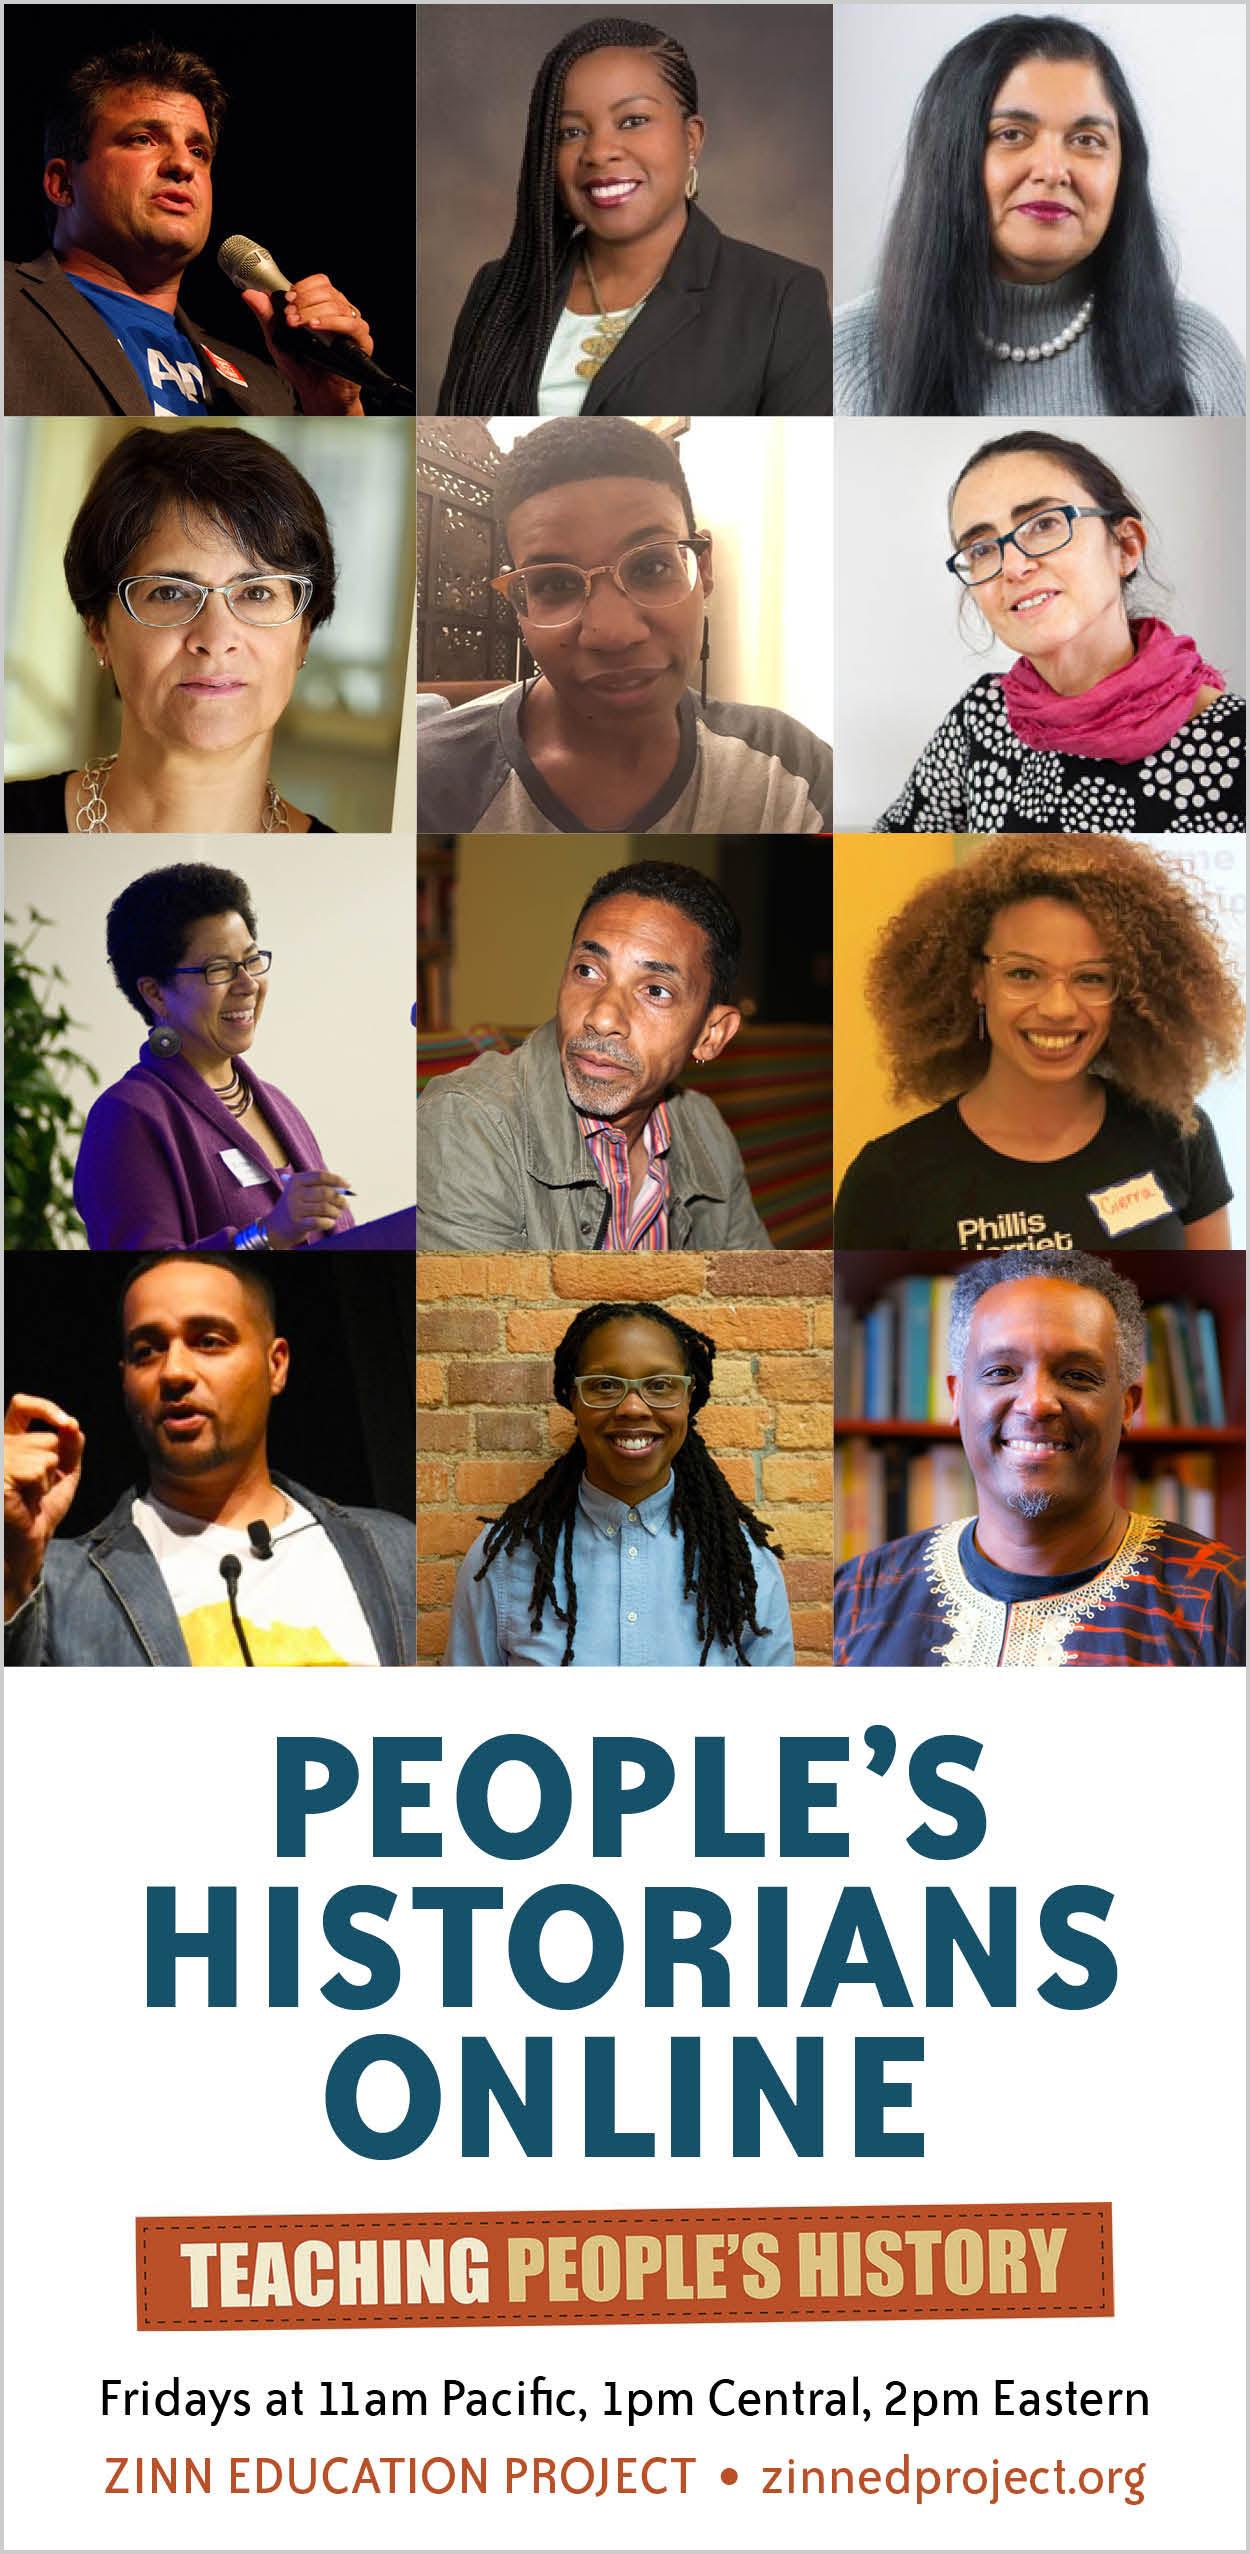 People Historians Online (vertical) | Zinn Education Project